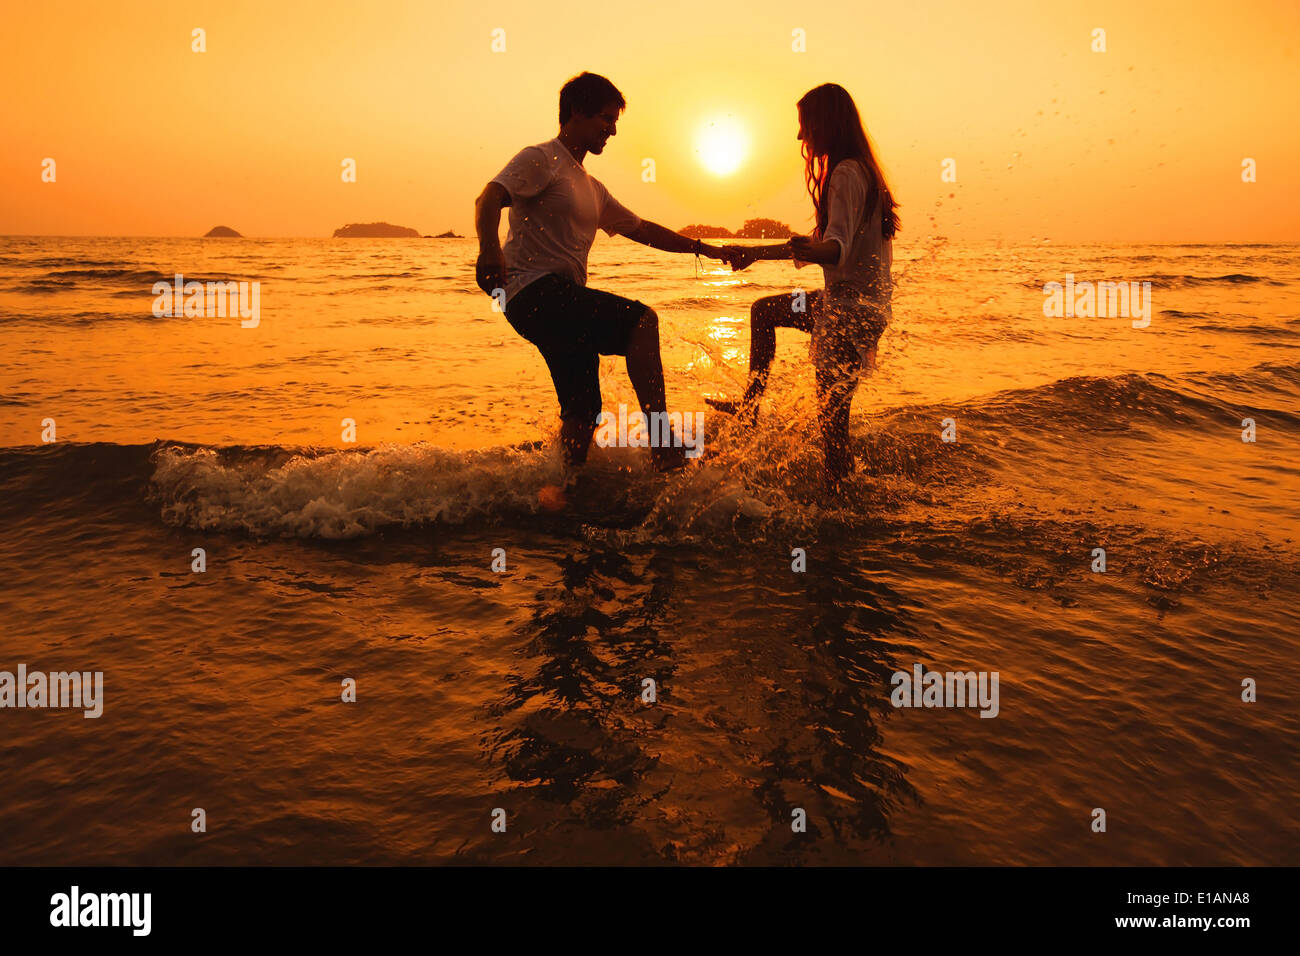 couple having fun in the sea at sunset beach - Stock Image